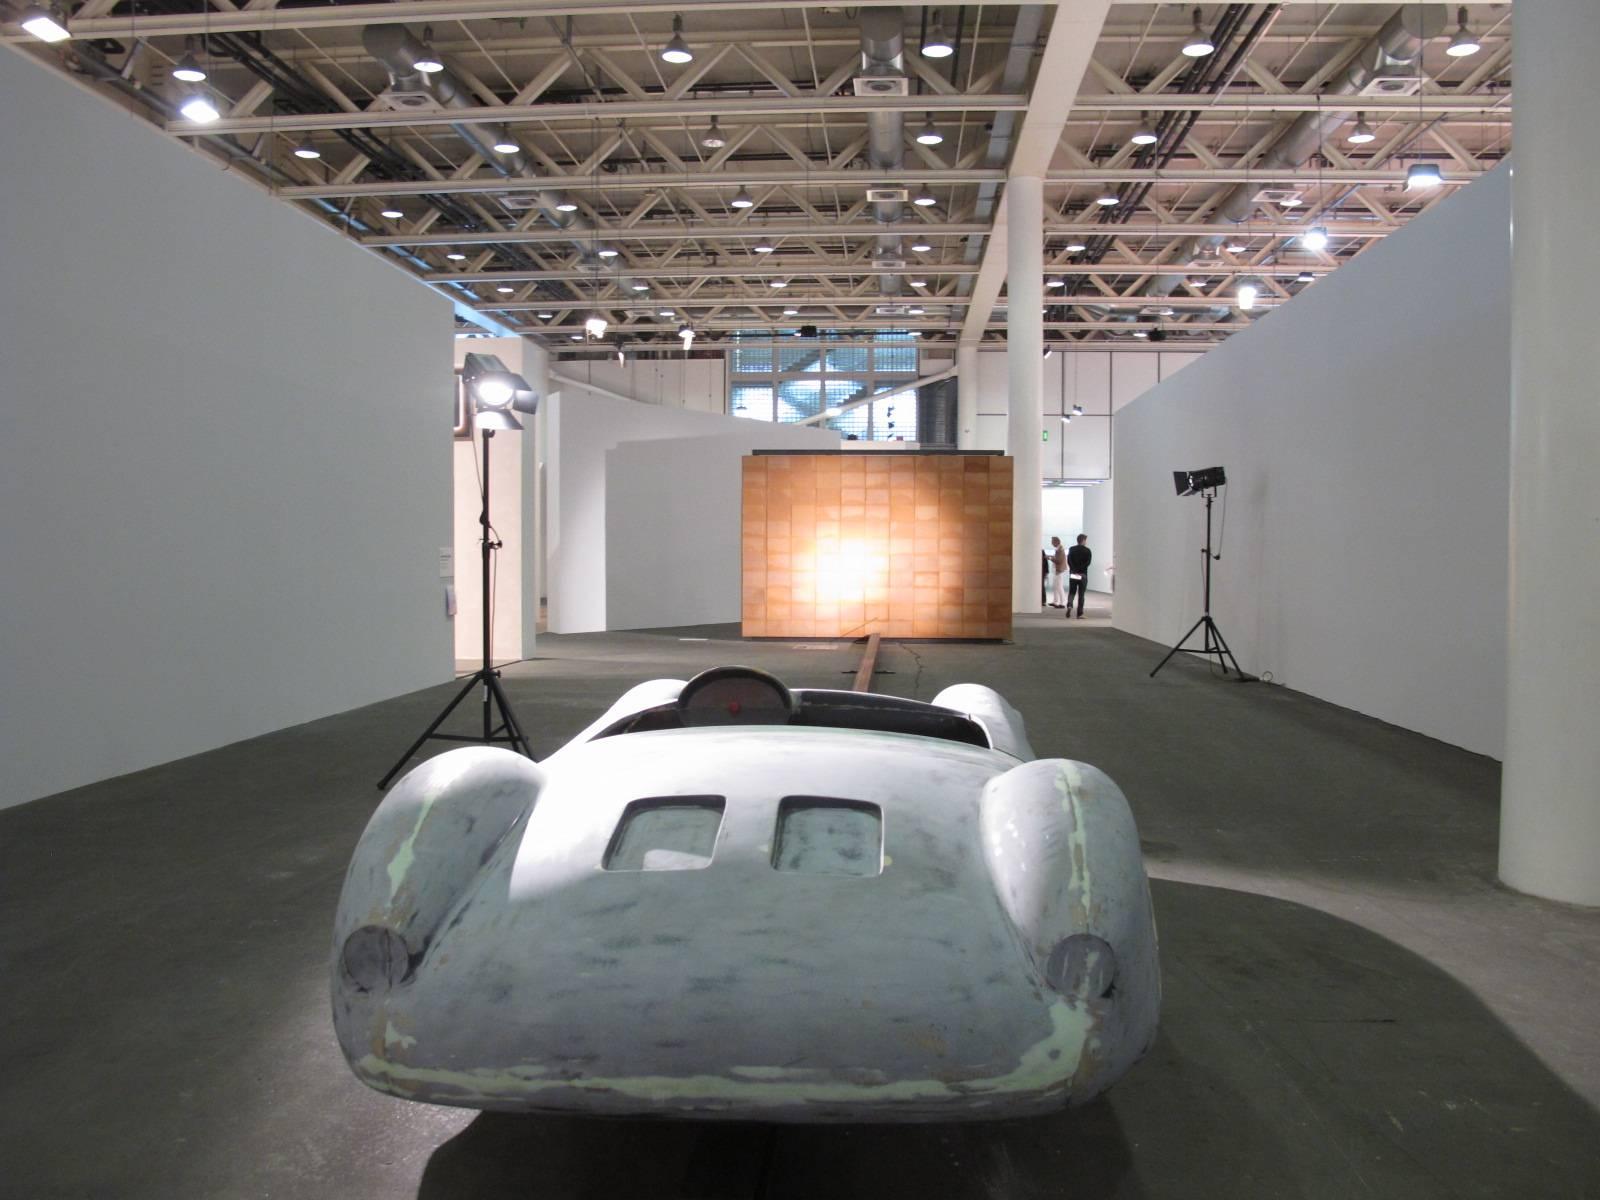 Michael Sailstorfer at Art Unlimited. Photo by Yanyan Huang